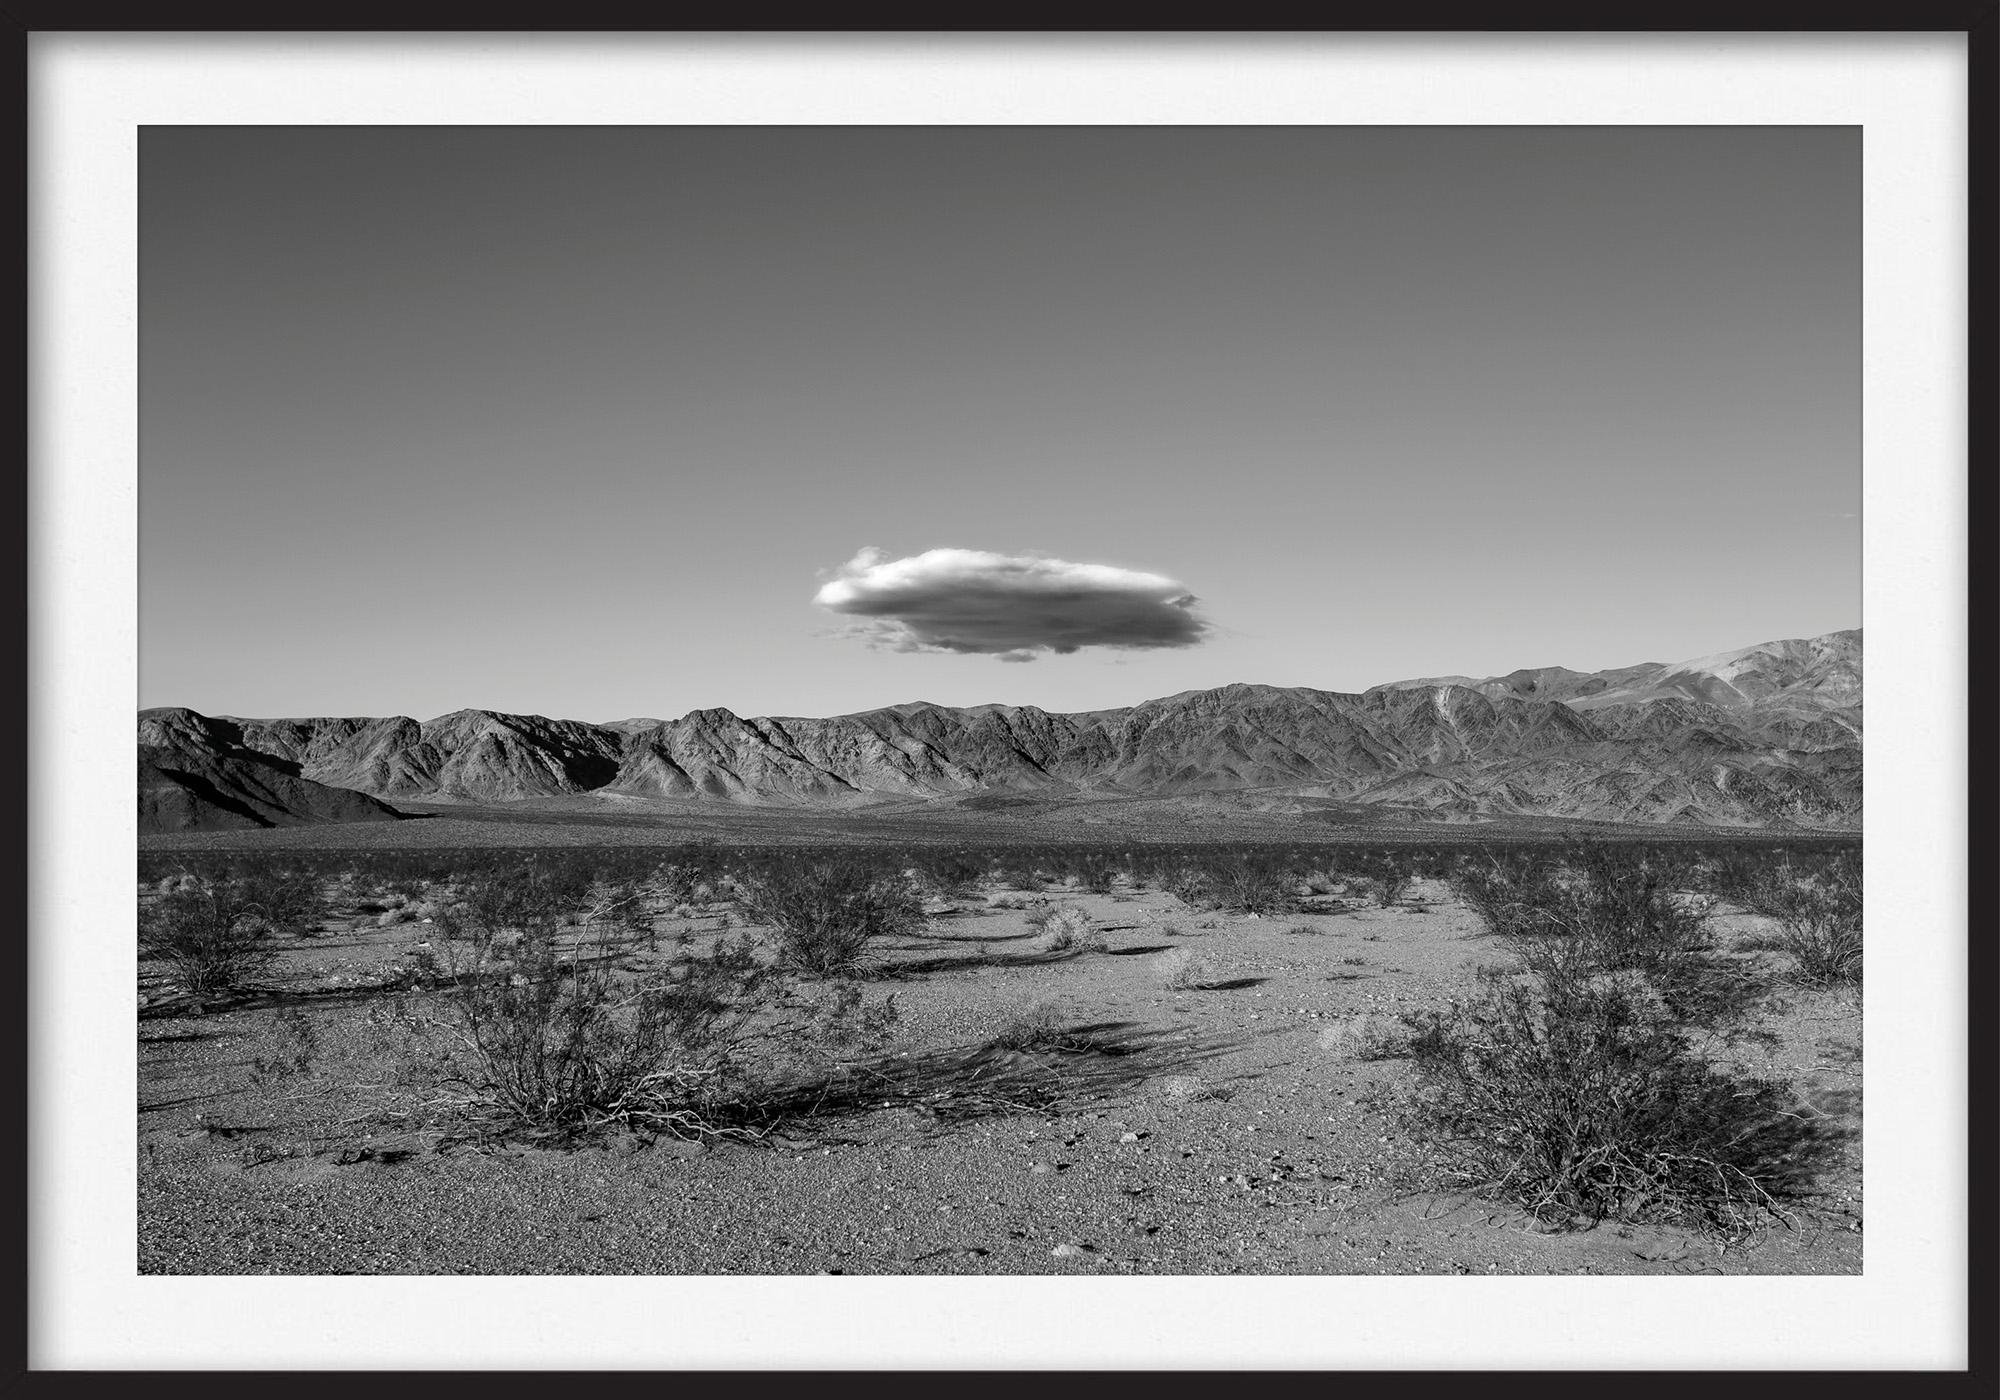 Thomas Illemann arkitekturfotografi photography landscape landskab california black white sort hvid